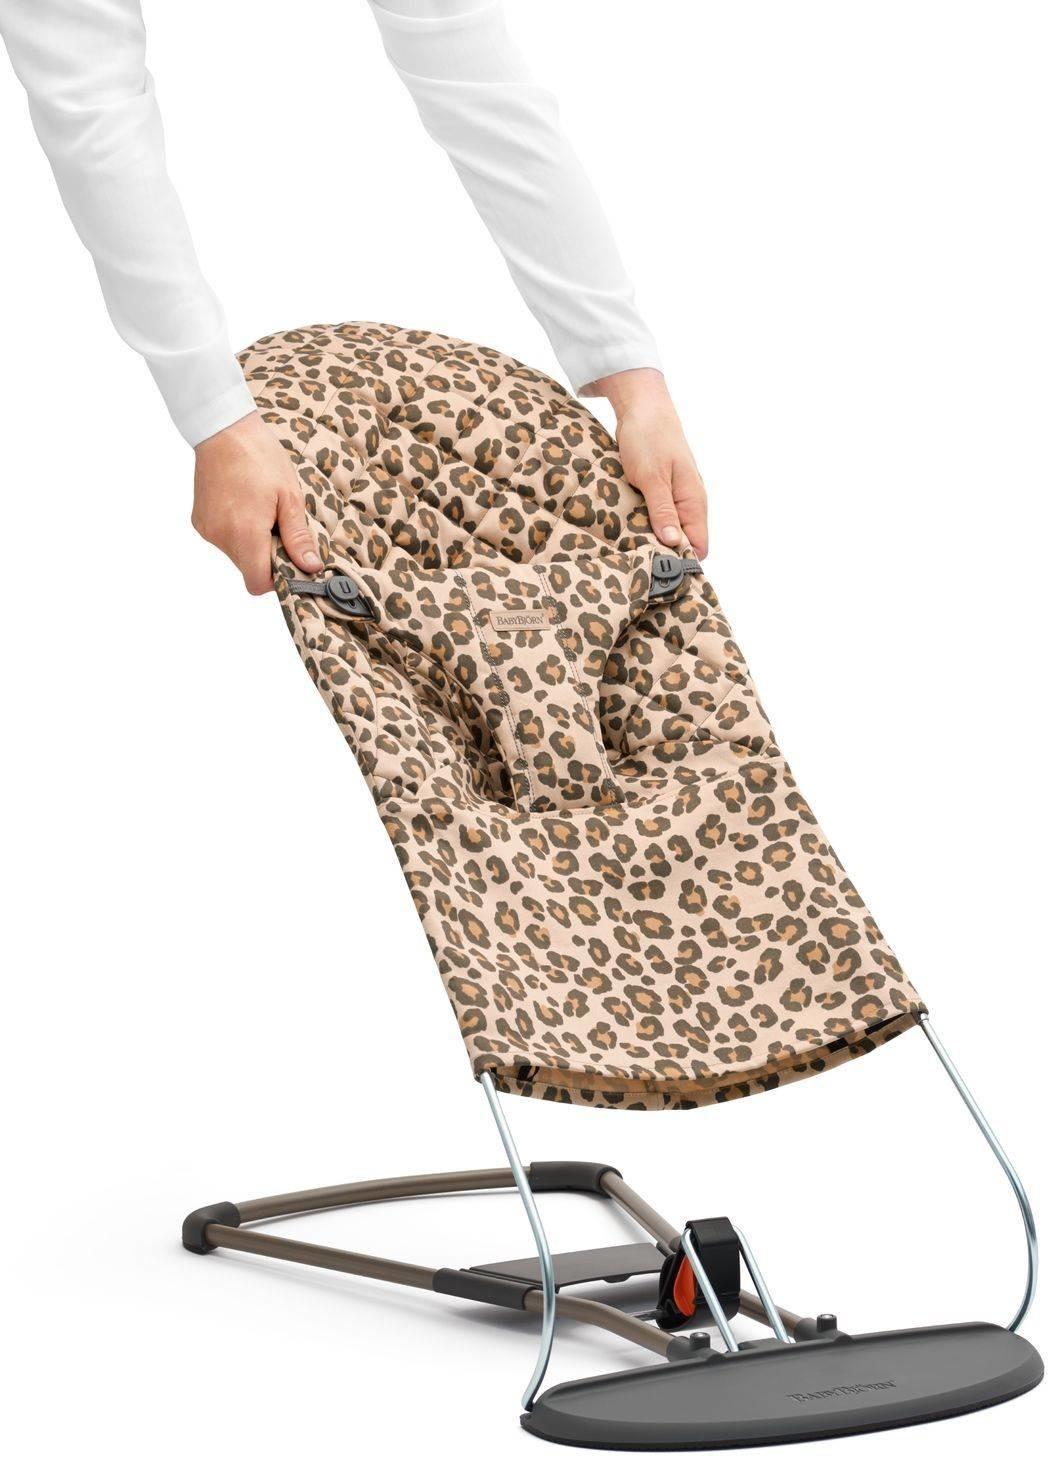 BABYBJORN poszycie do leżaczka Balance Bliss Beż/Leopard, Cotton scandinavian-baby-9387-0